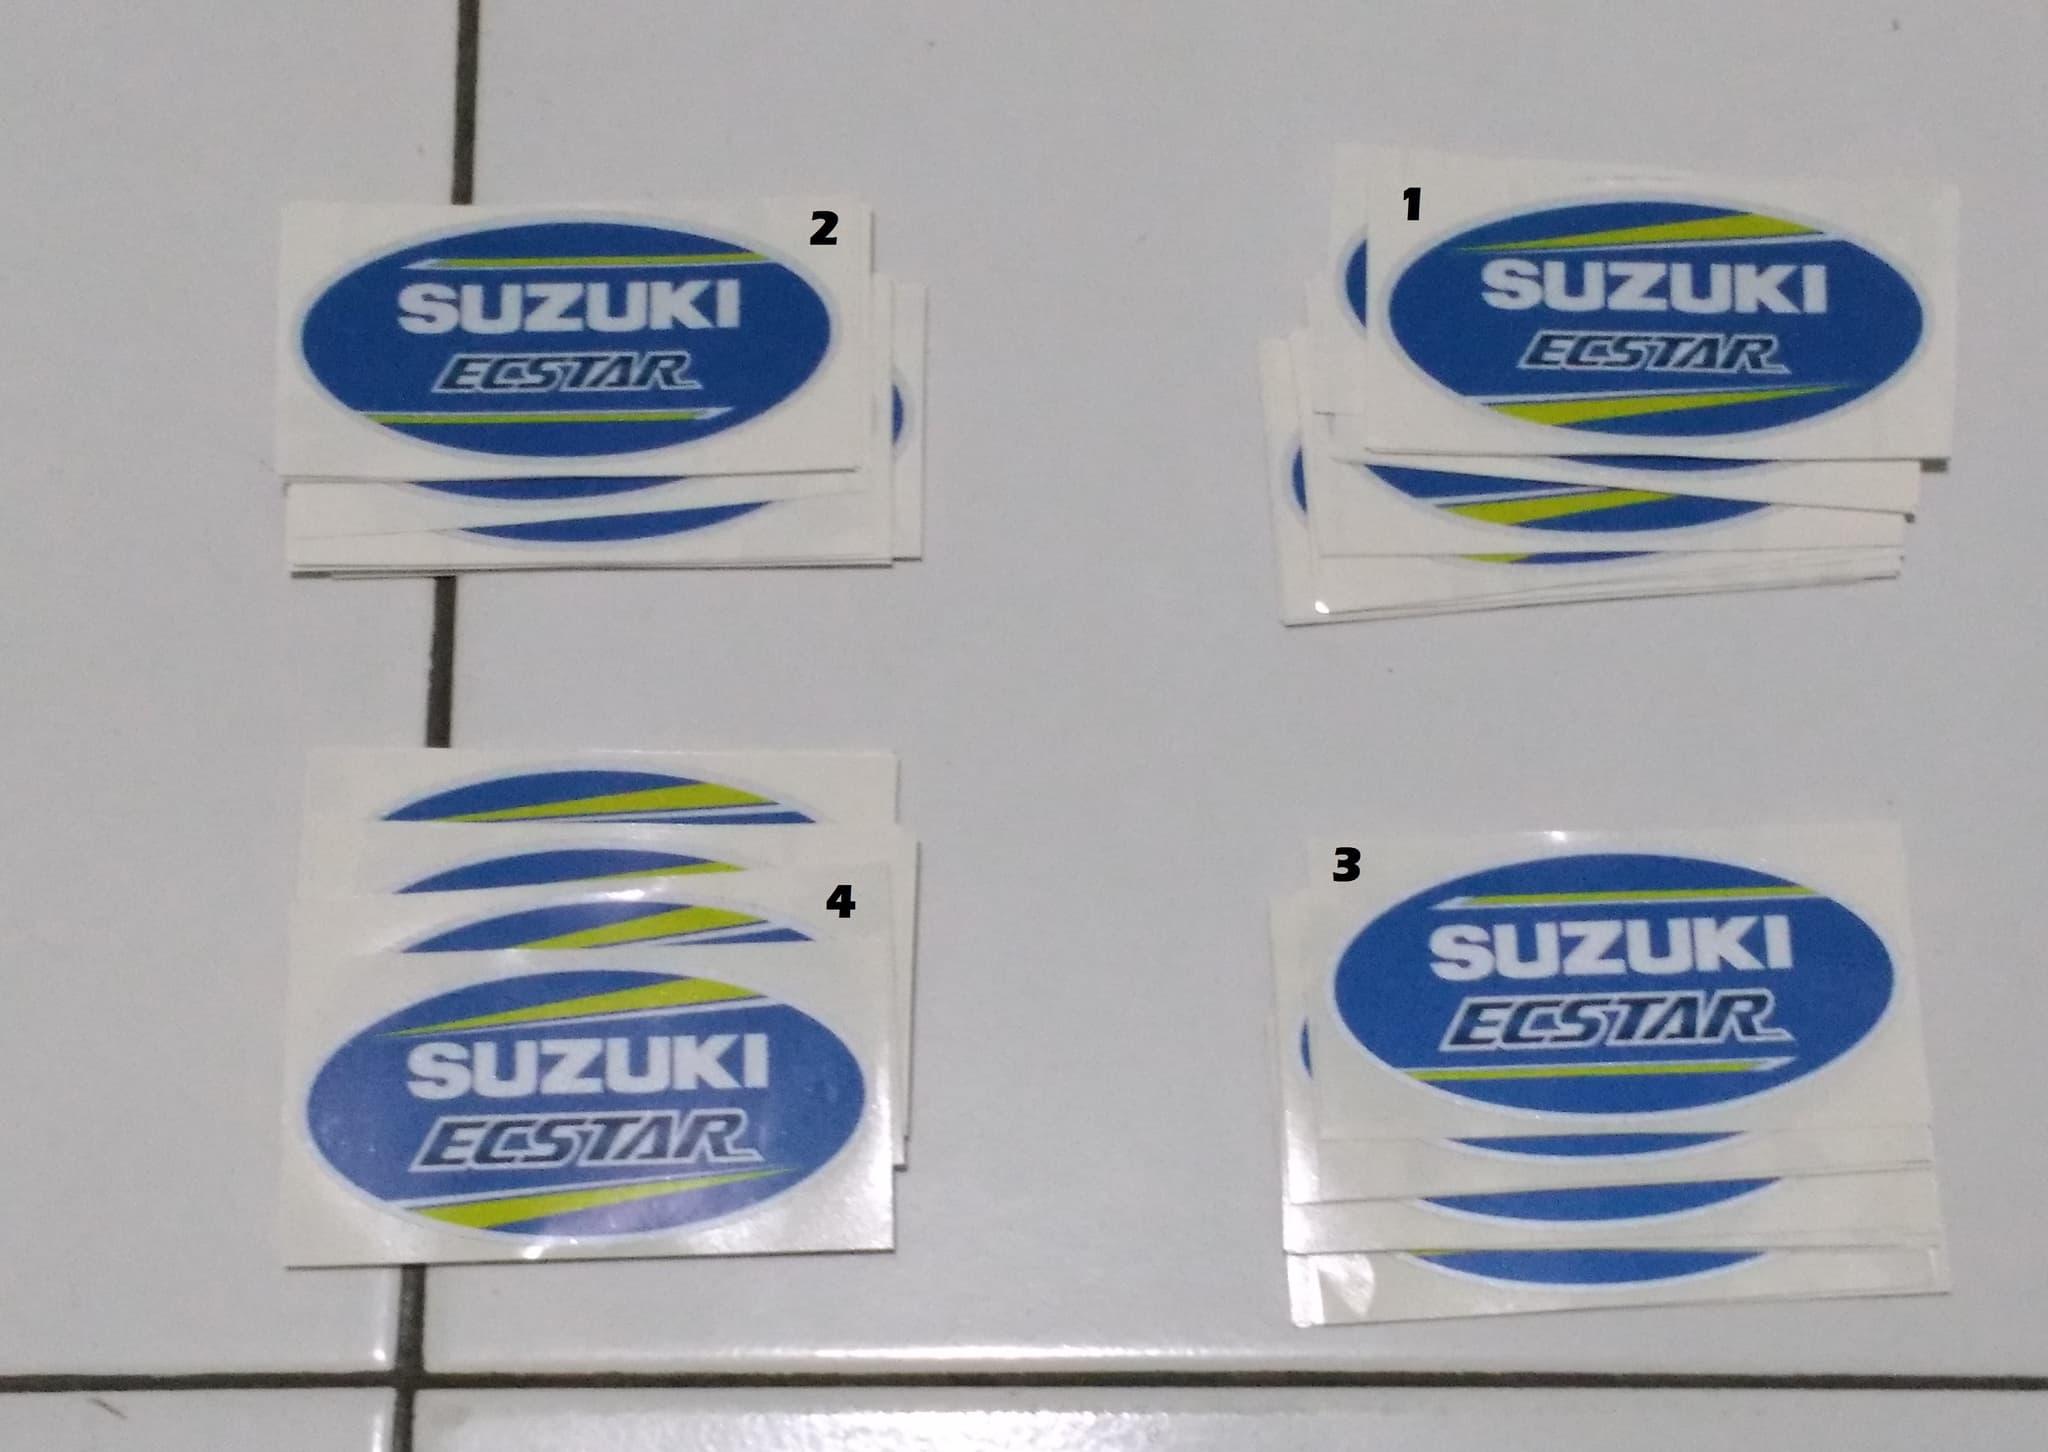 Jual sticker 3m printing logo suzuki ecstar 10 x 5 cm universal